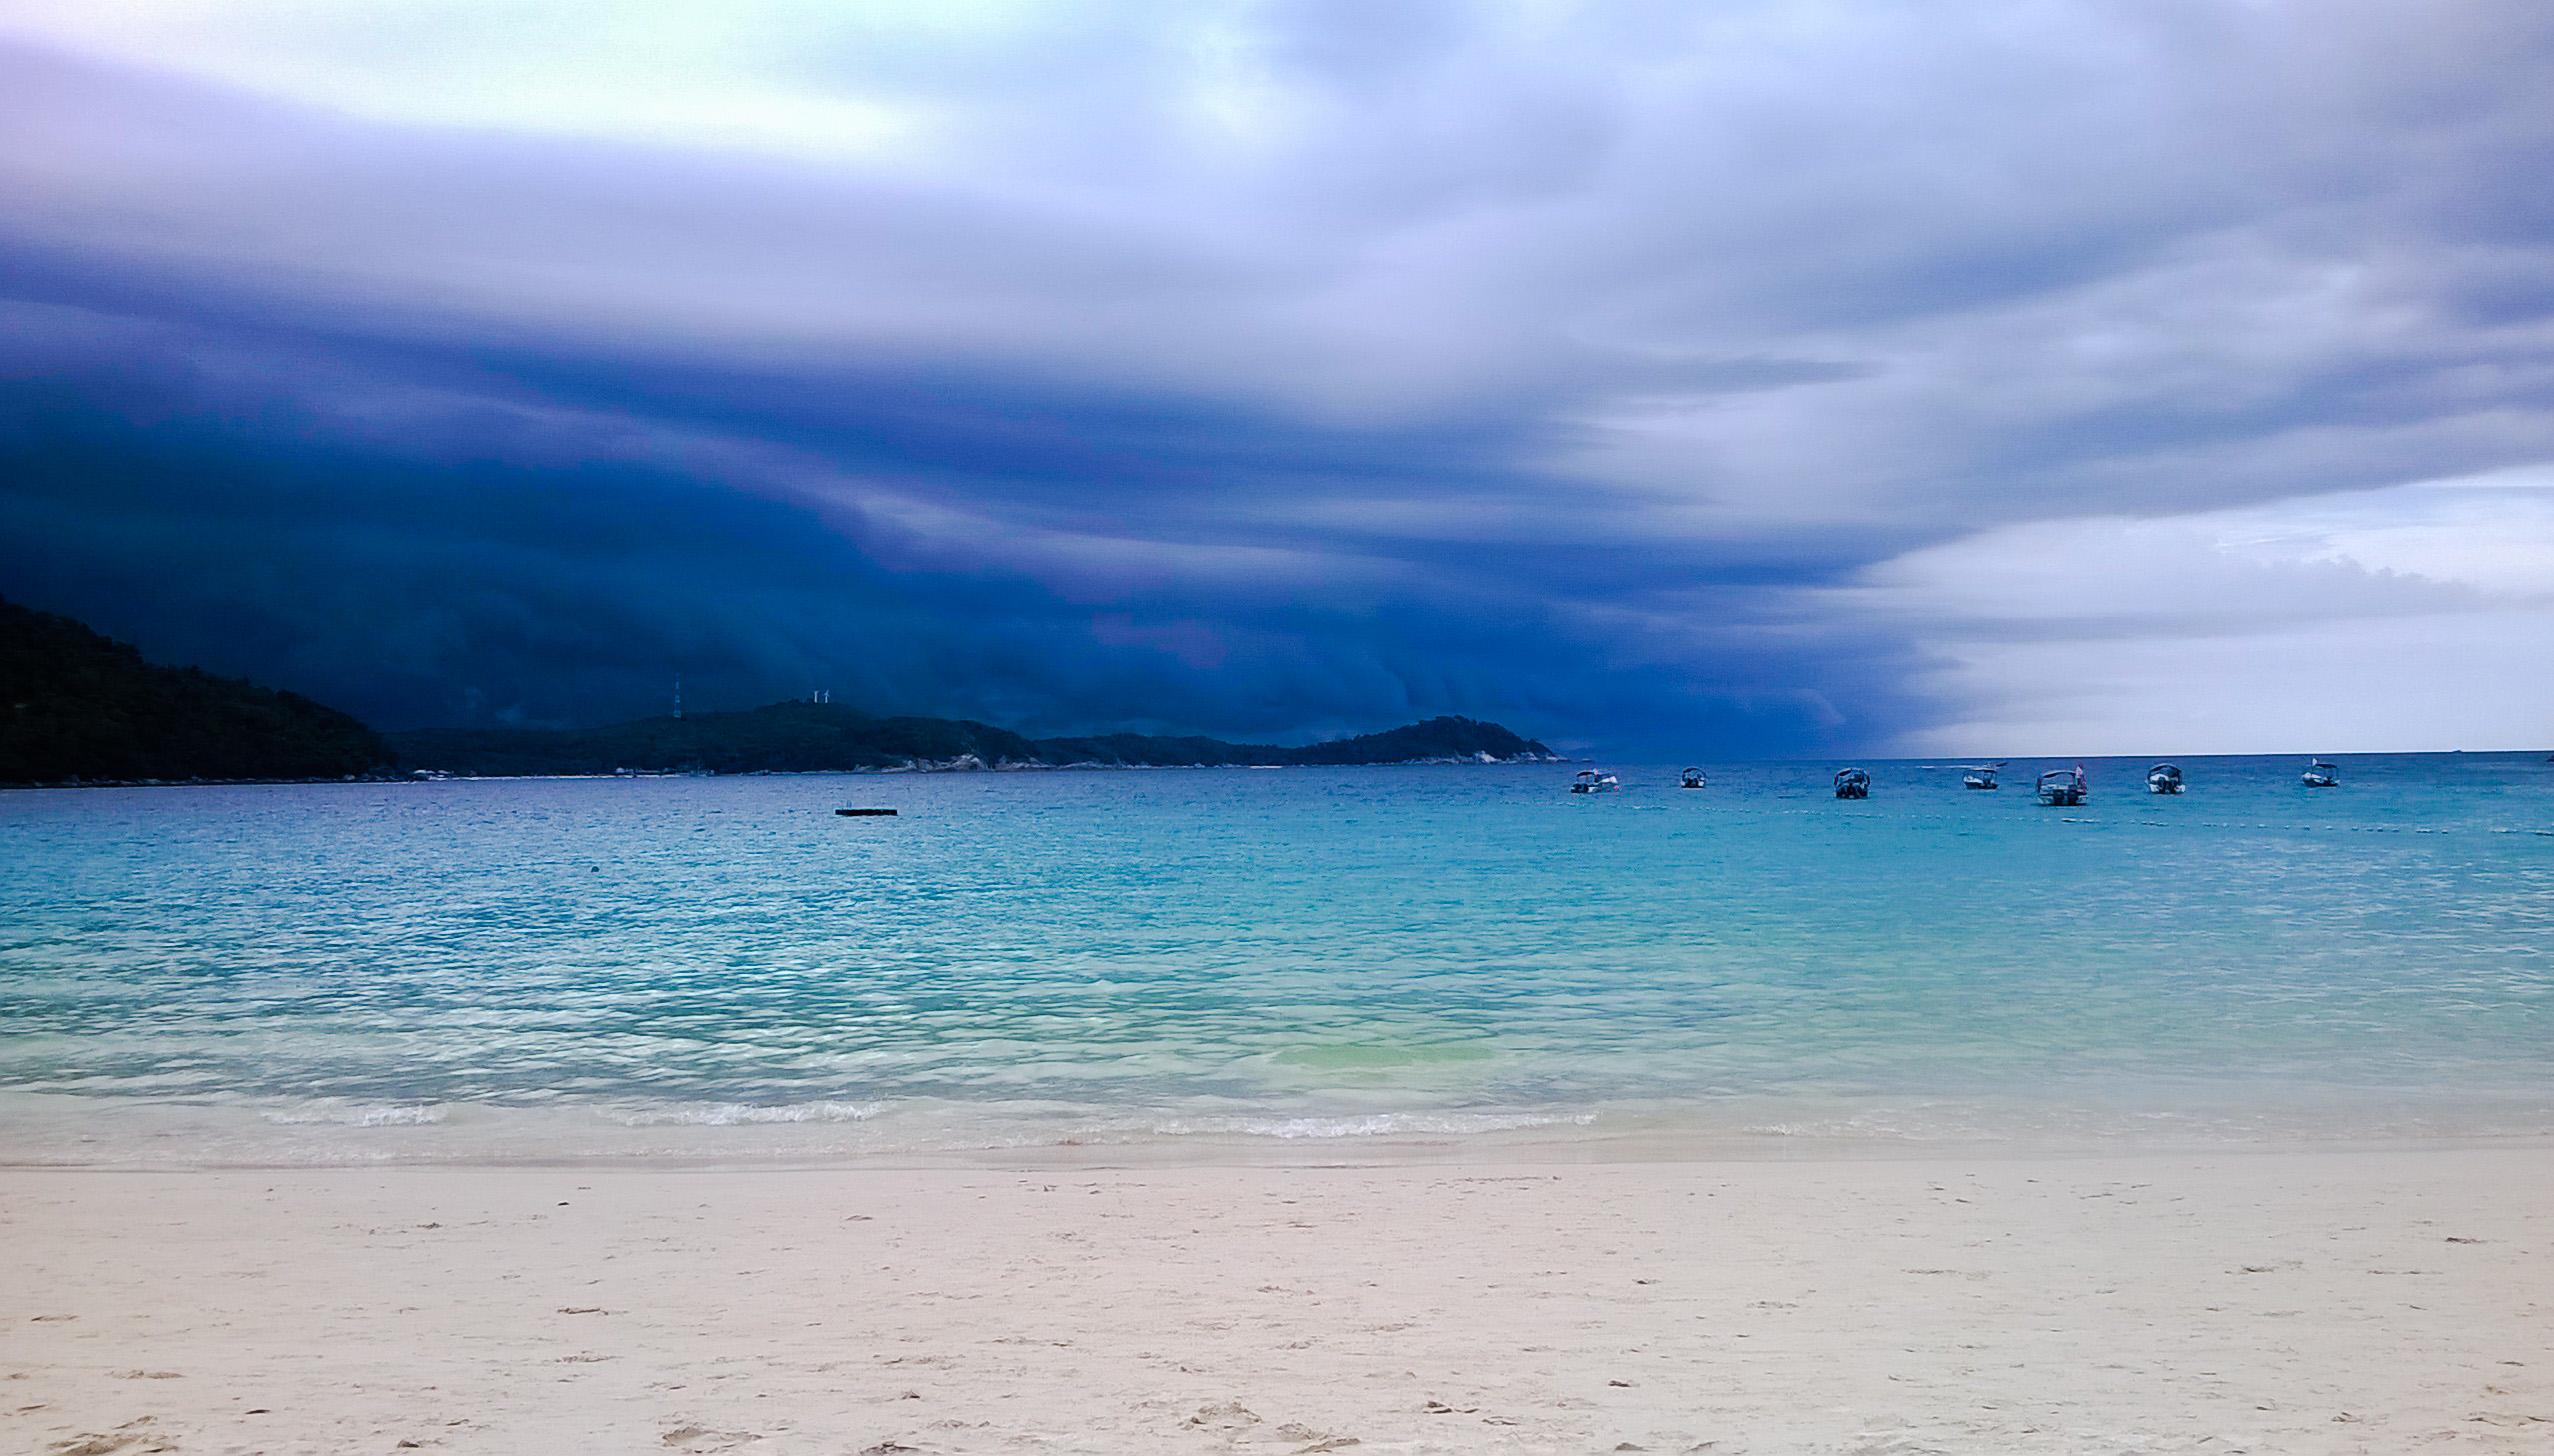 Image plage perhentian island resort